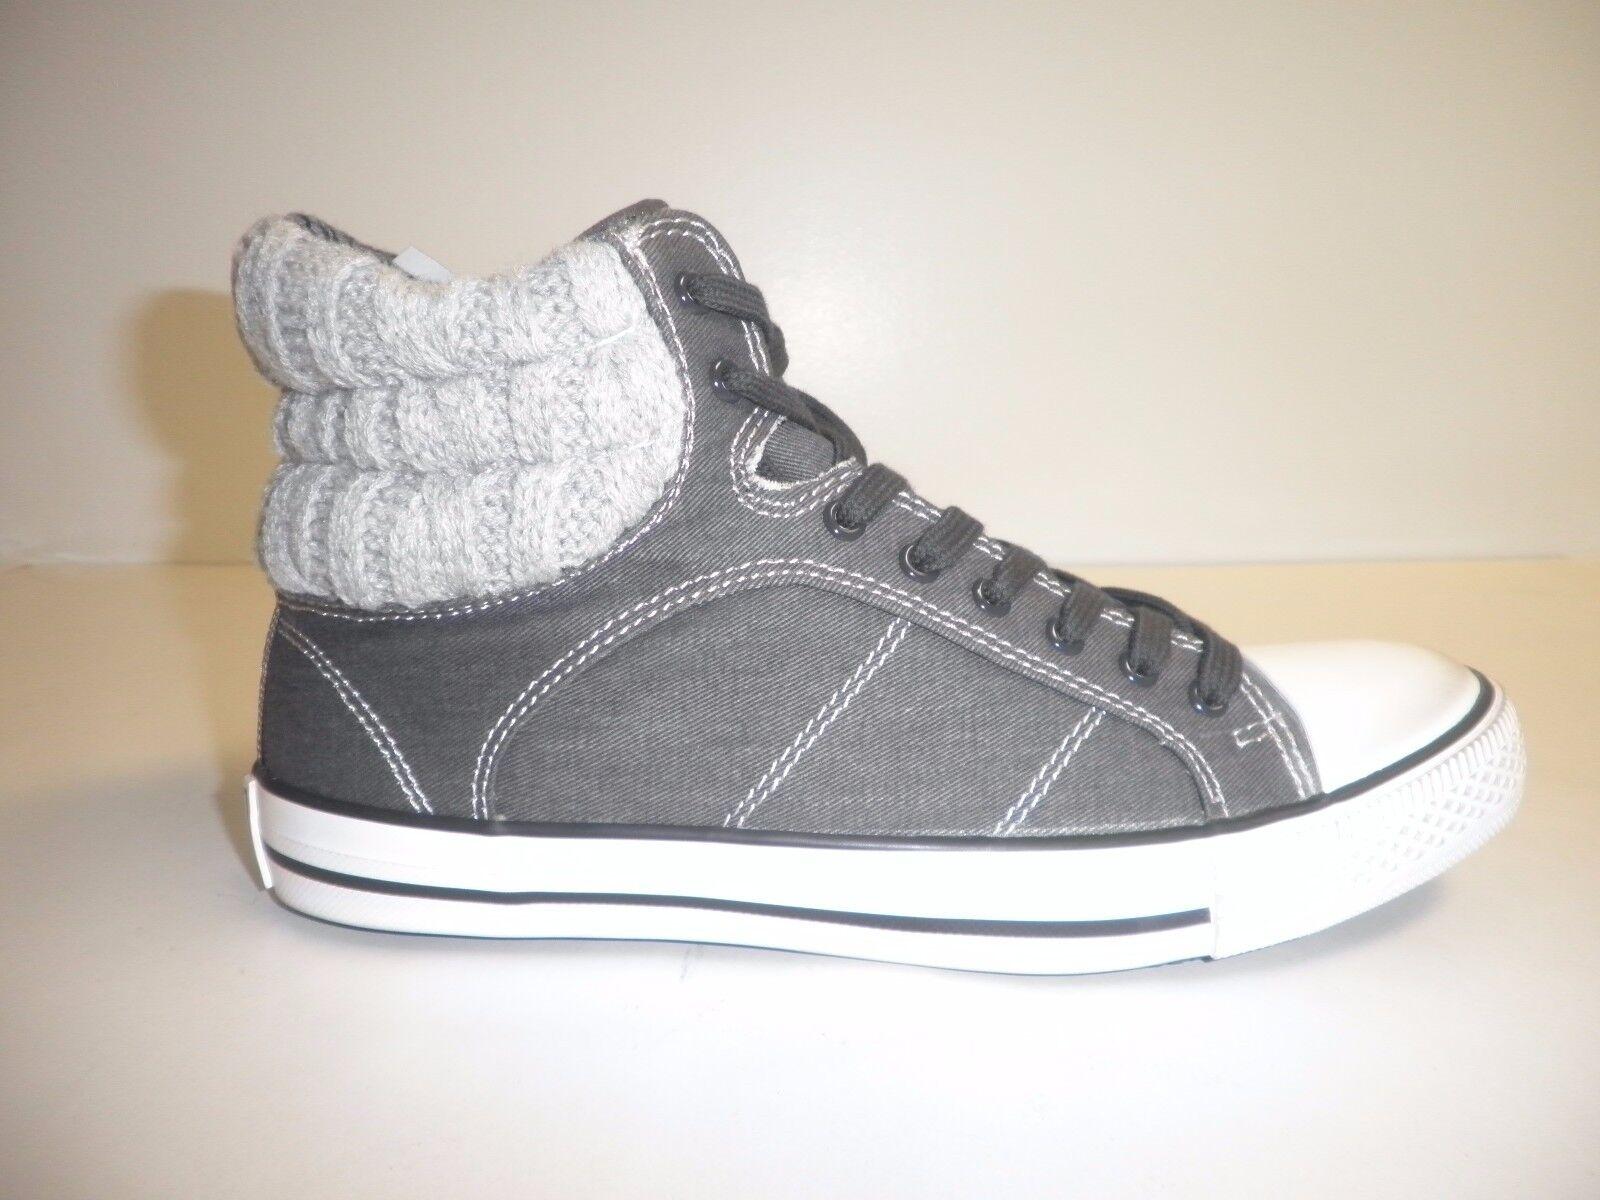 Splendid Size 5.5 M ESSEX Black Grey Fashion Sneakers New Womens Shoes